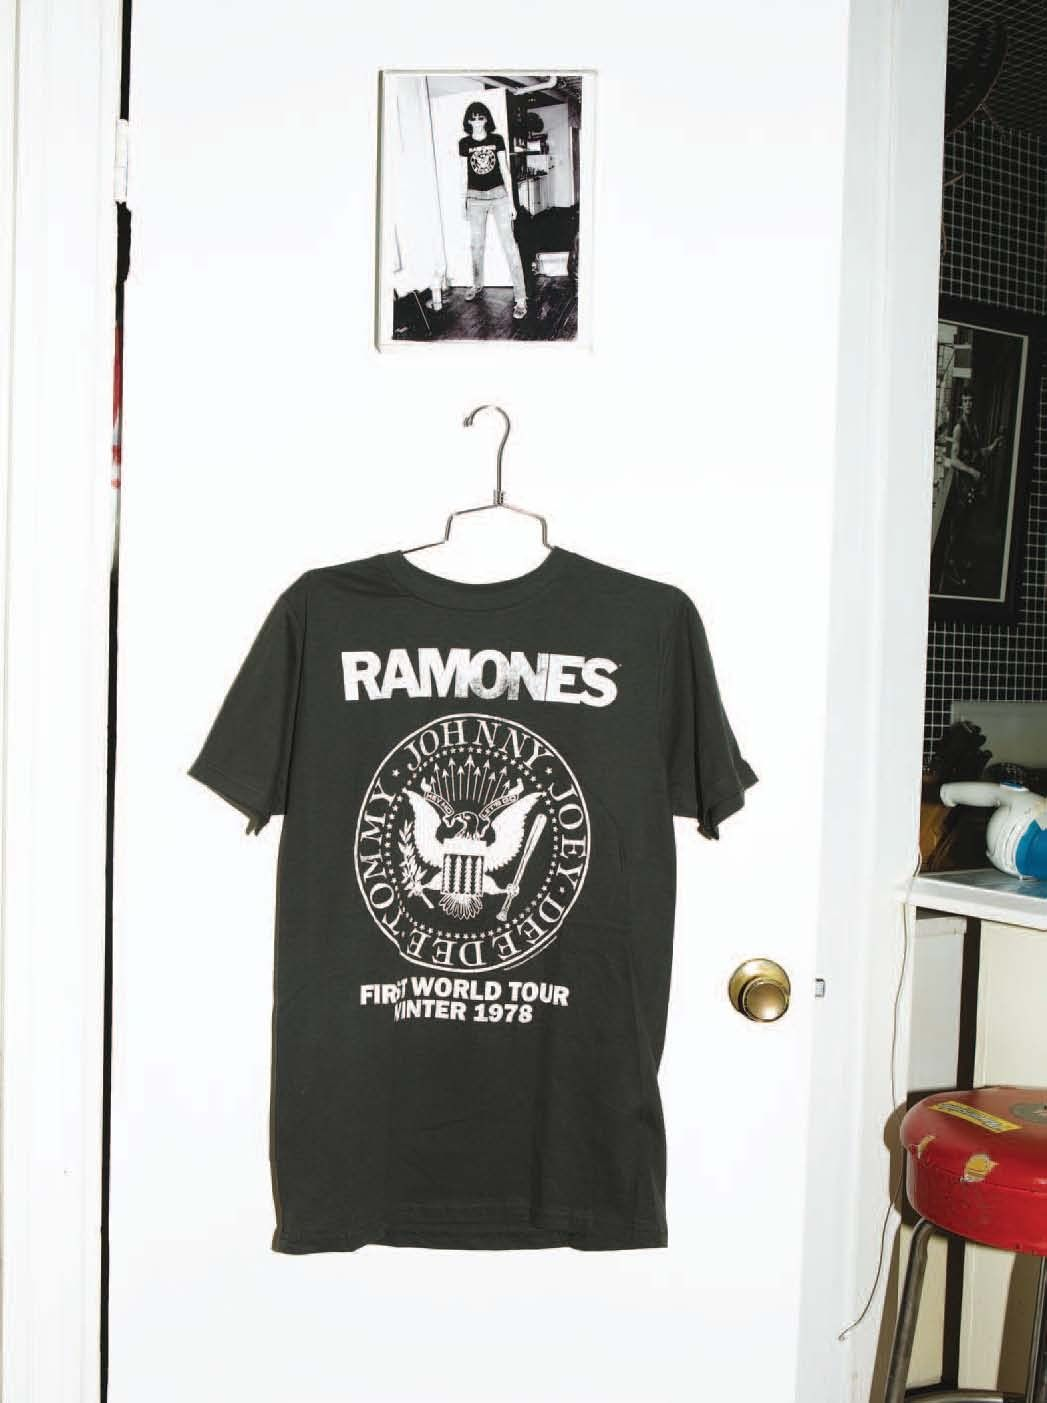 949cfe1e9 Group · Shirts · Display · El vuelo del águila con bat | VICE México Tee  Design, Rock Style, Ramones